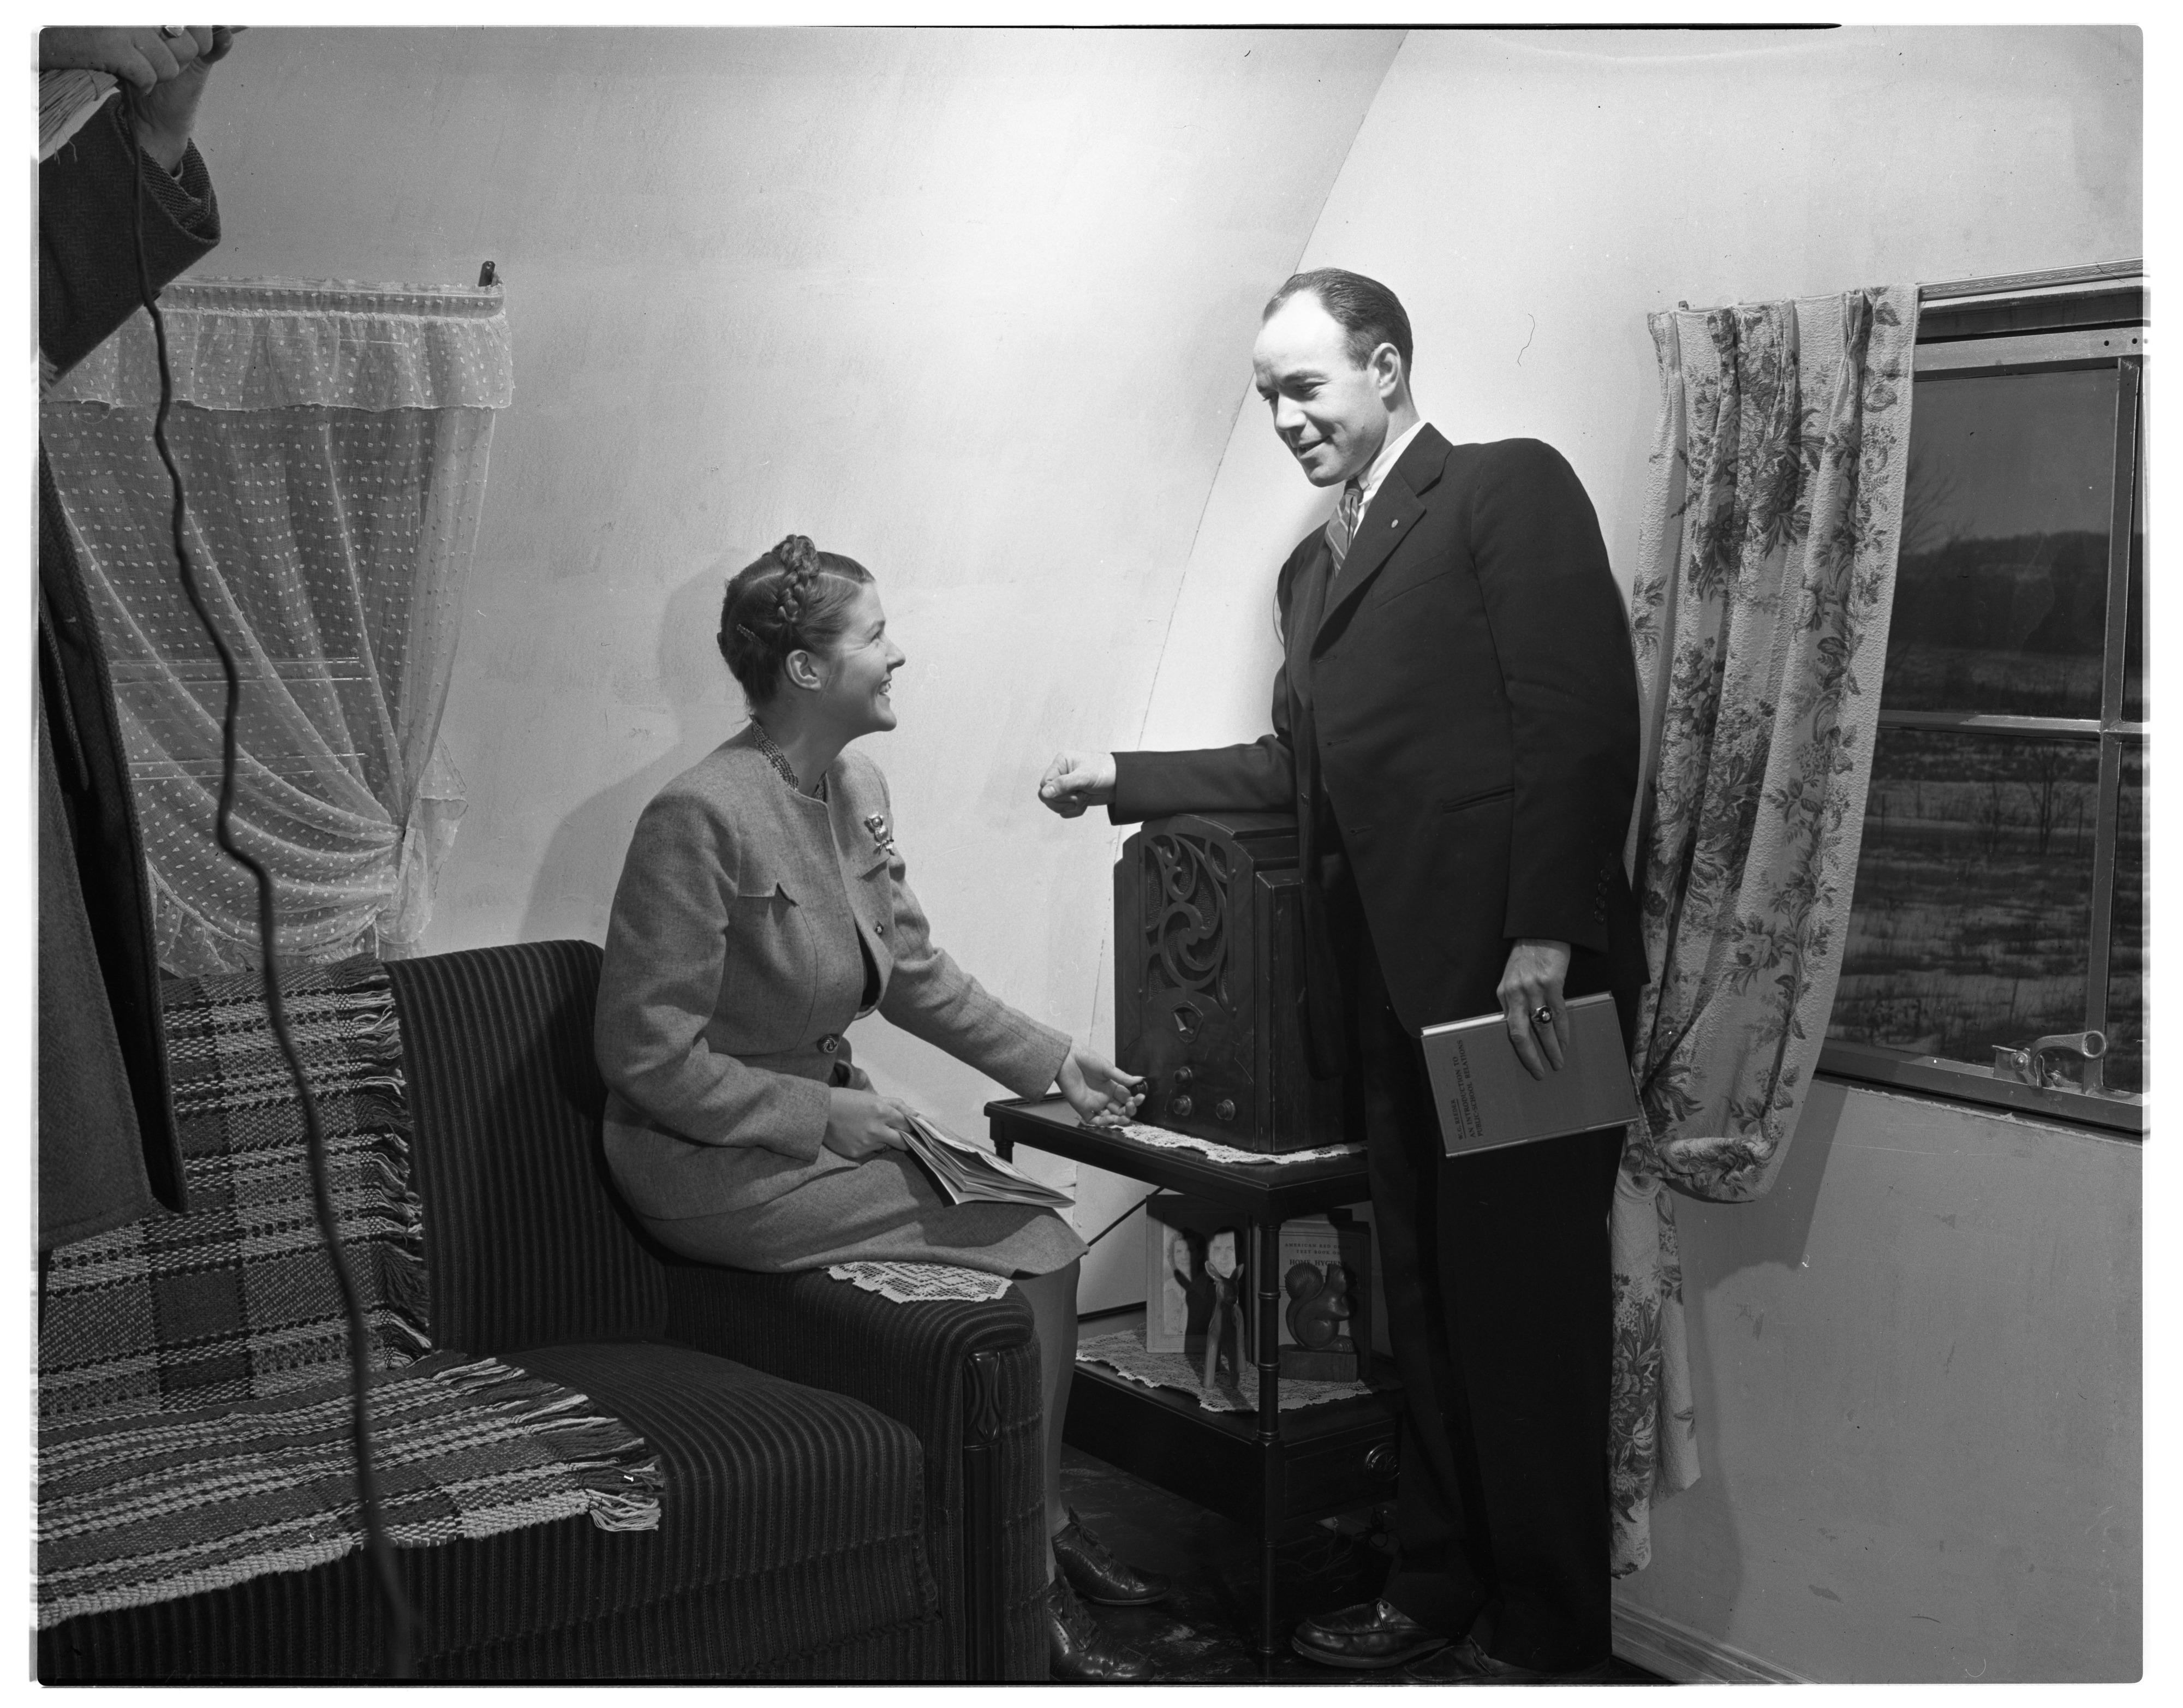 Quonset Hut Home, Interior, Ann Arbor, February 1947 Image